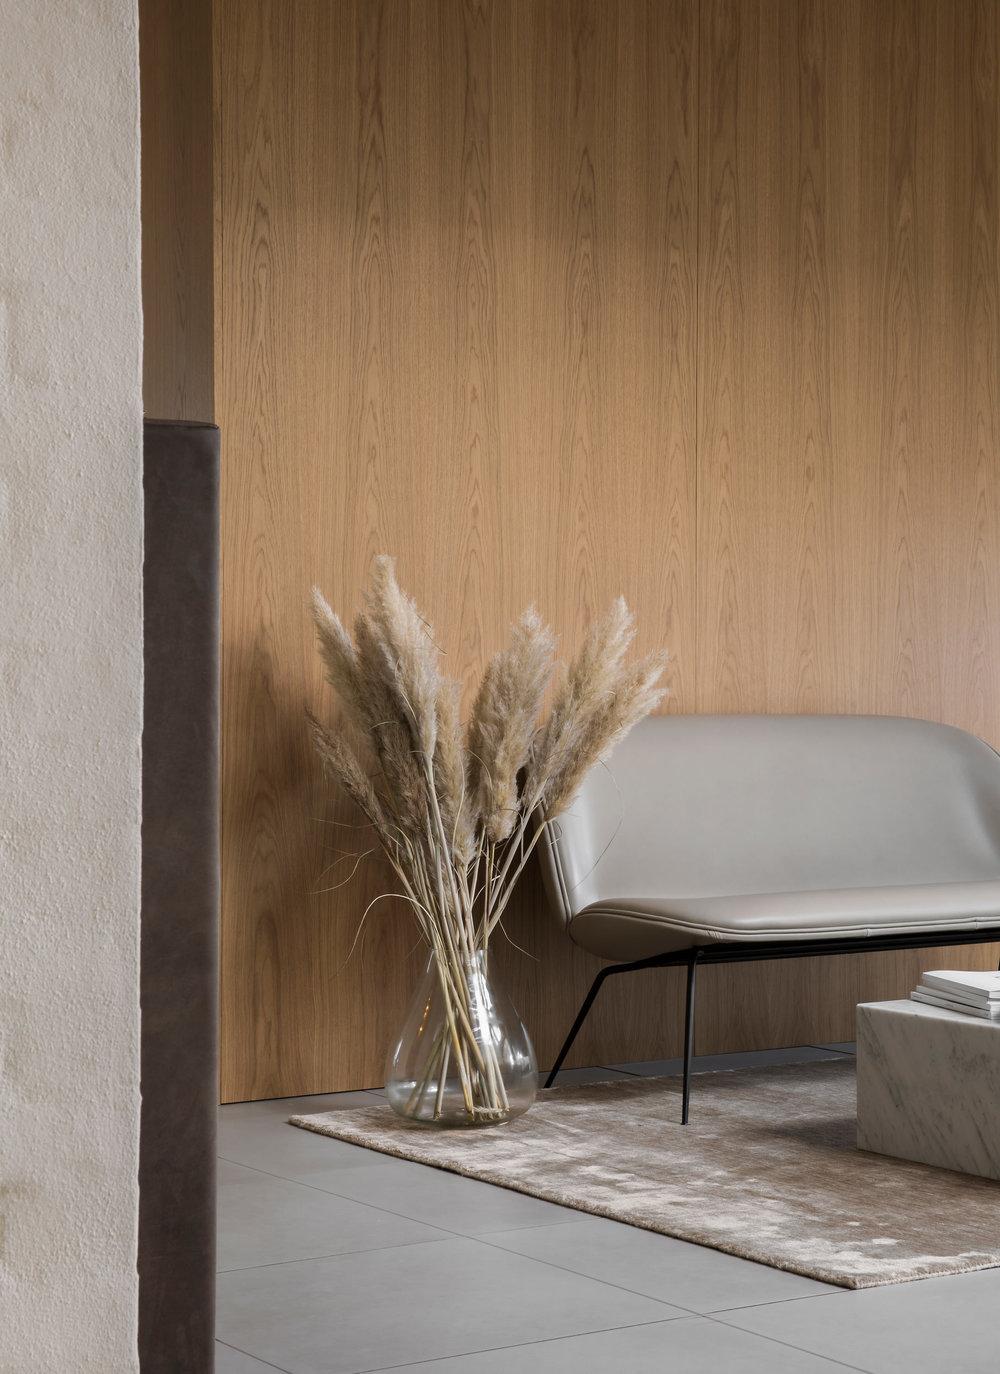 Sørensen HQ by Norm Architects on Anniversary Magazine